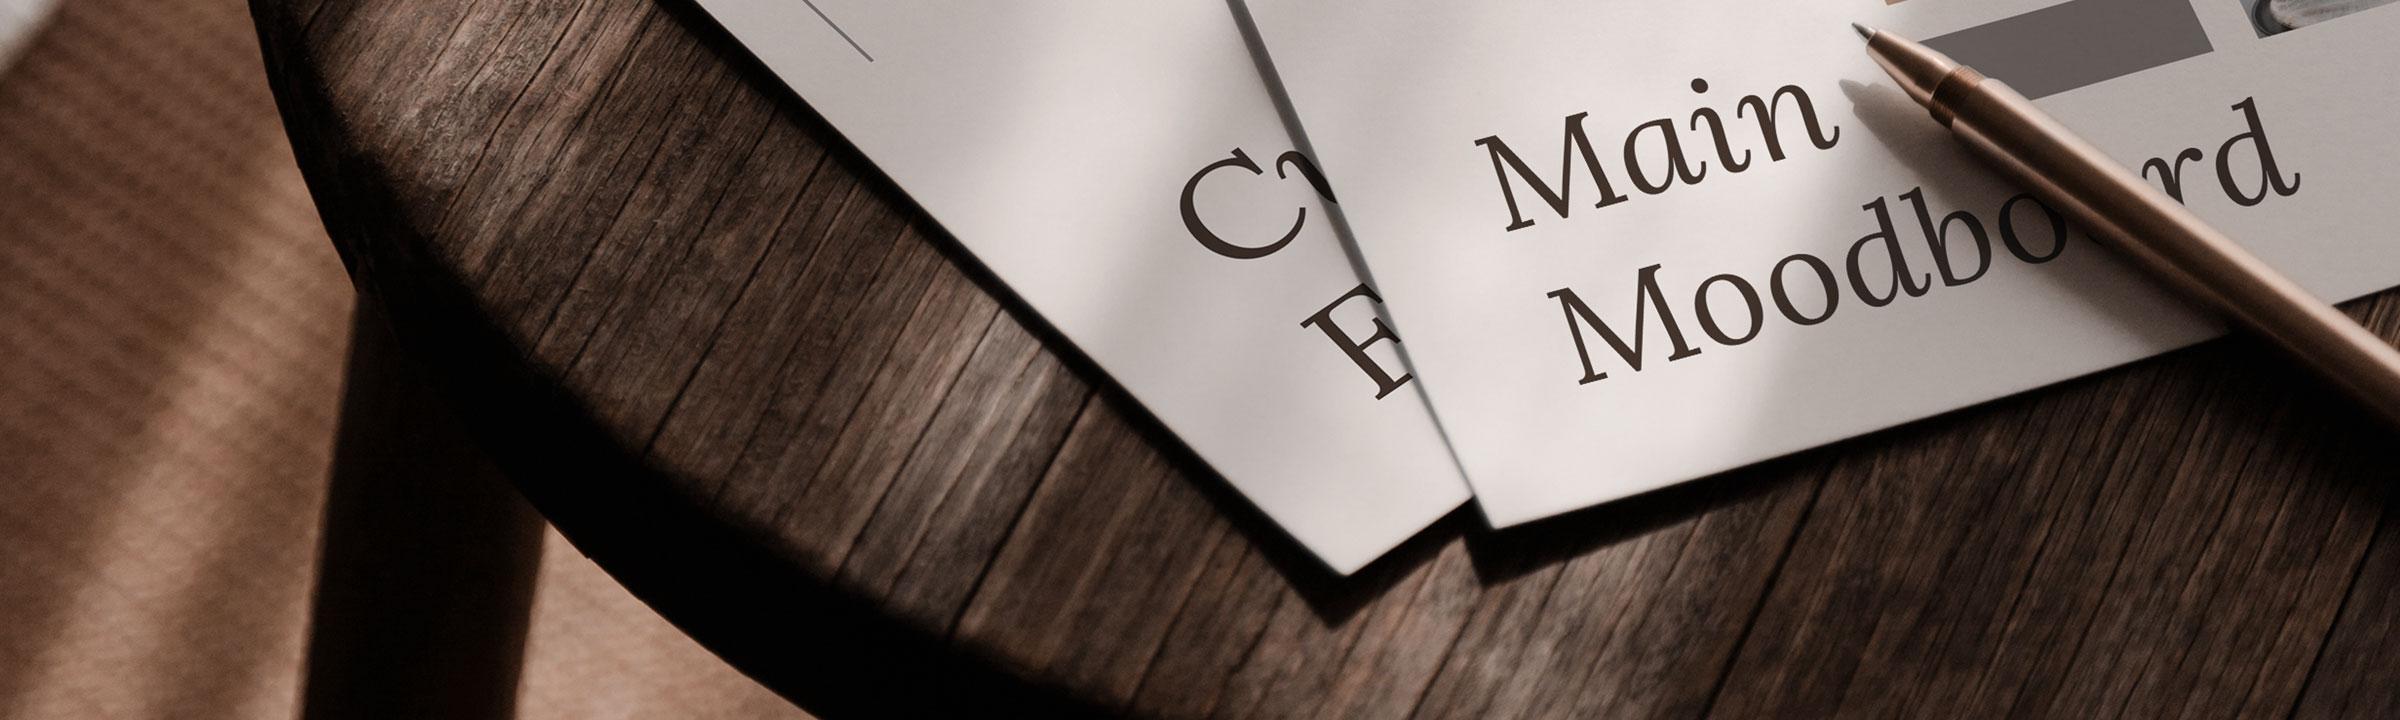 Branding process - Discovery